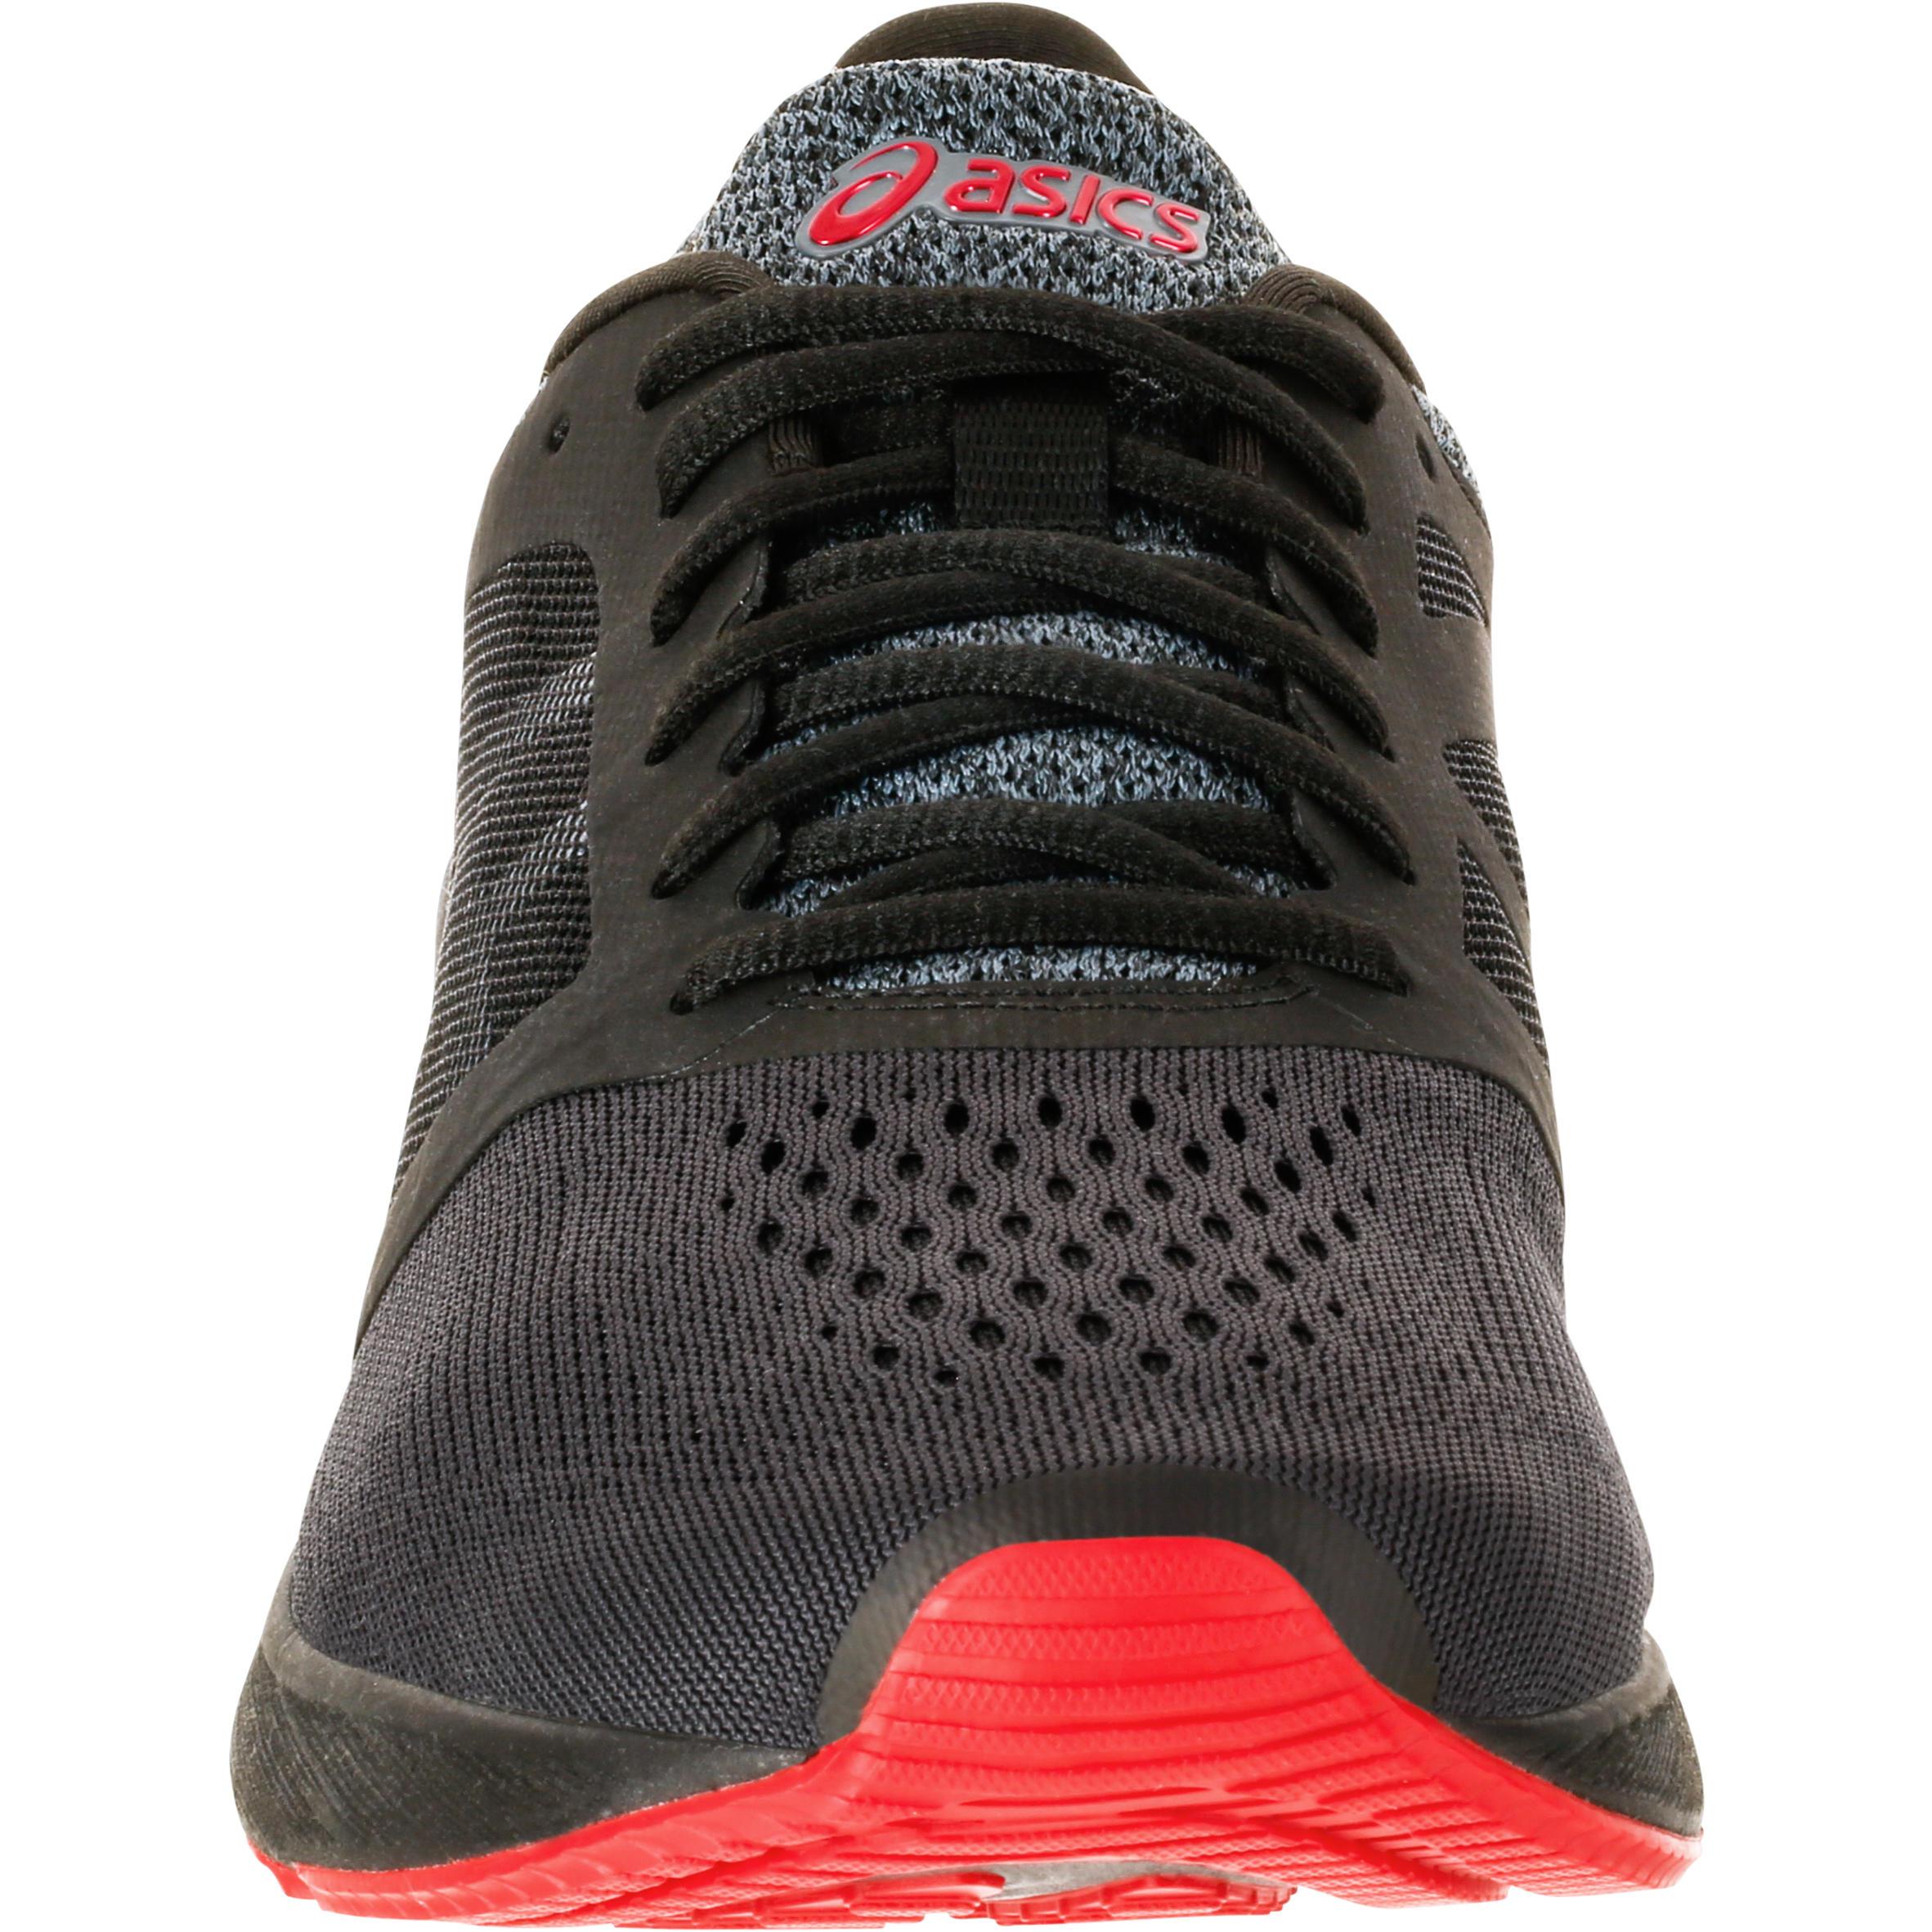 A Course Chaussures Pied Roadhawk Asics Noir Gel Ff Running FJc1Kl